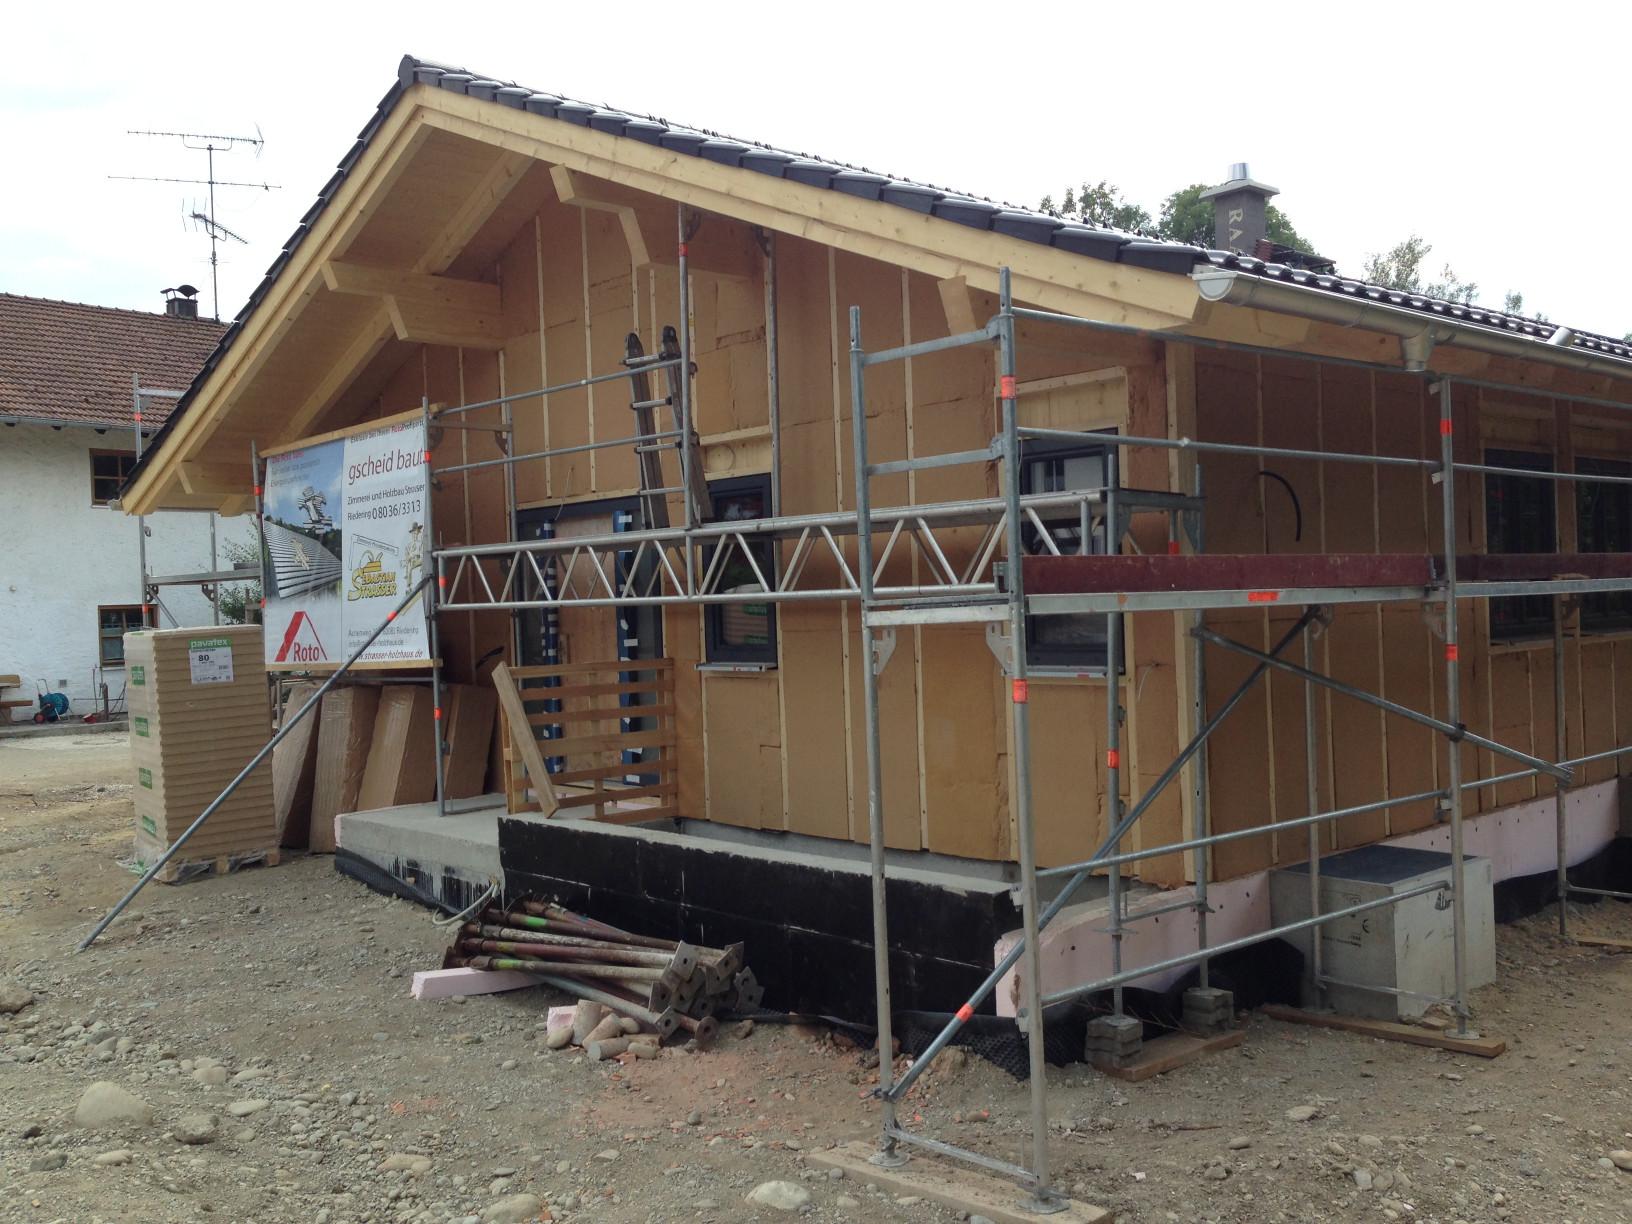 IMG_2893Strasser Holzbau Riedering.jpg